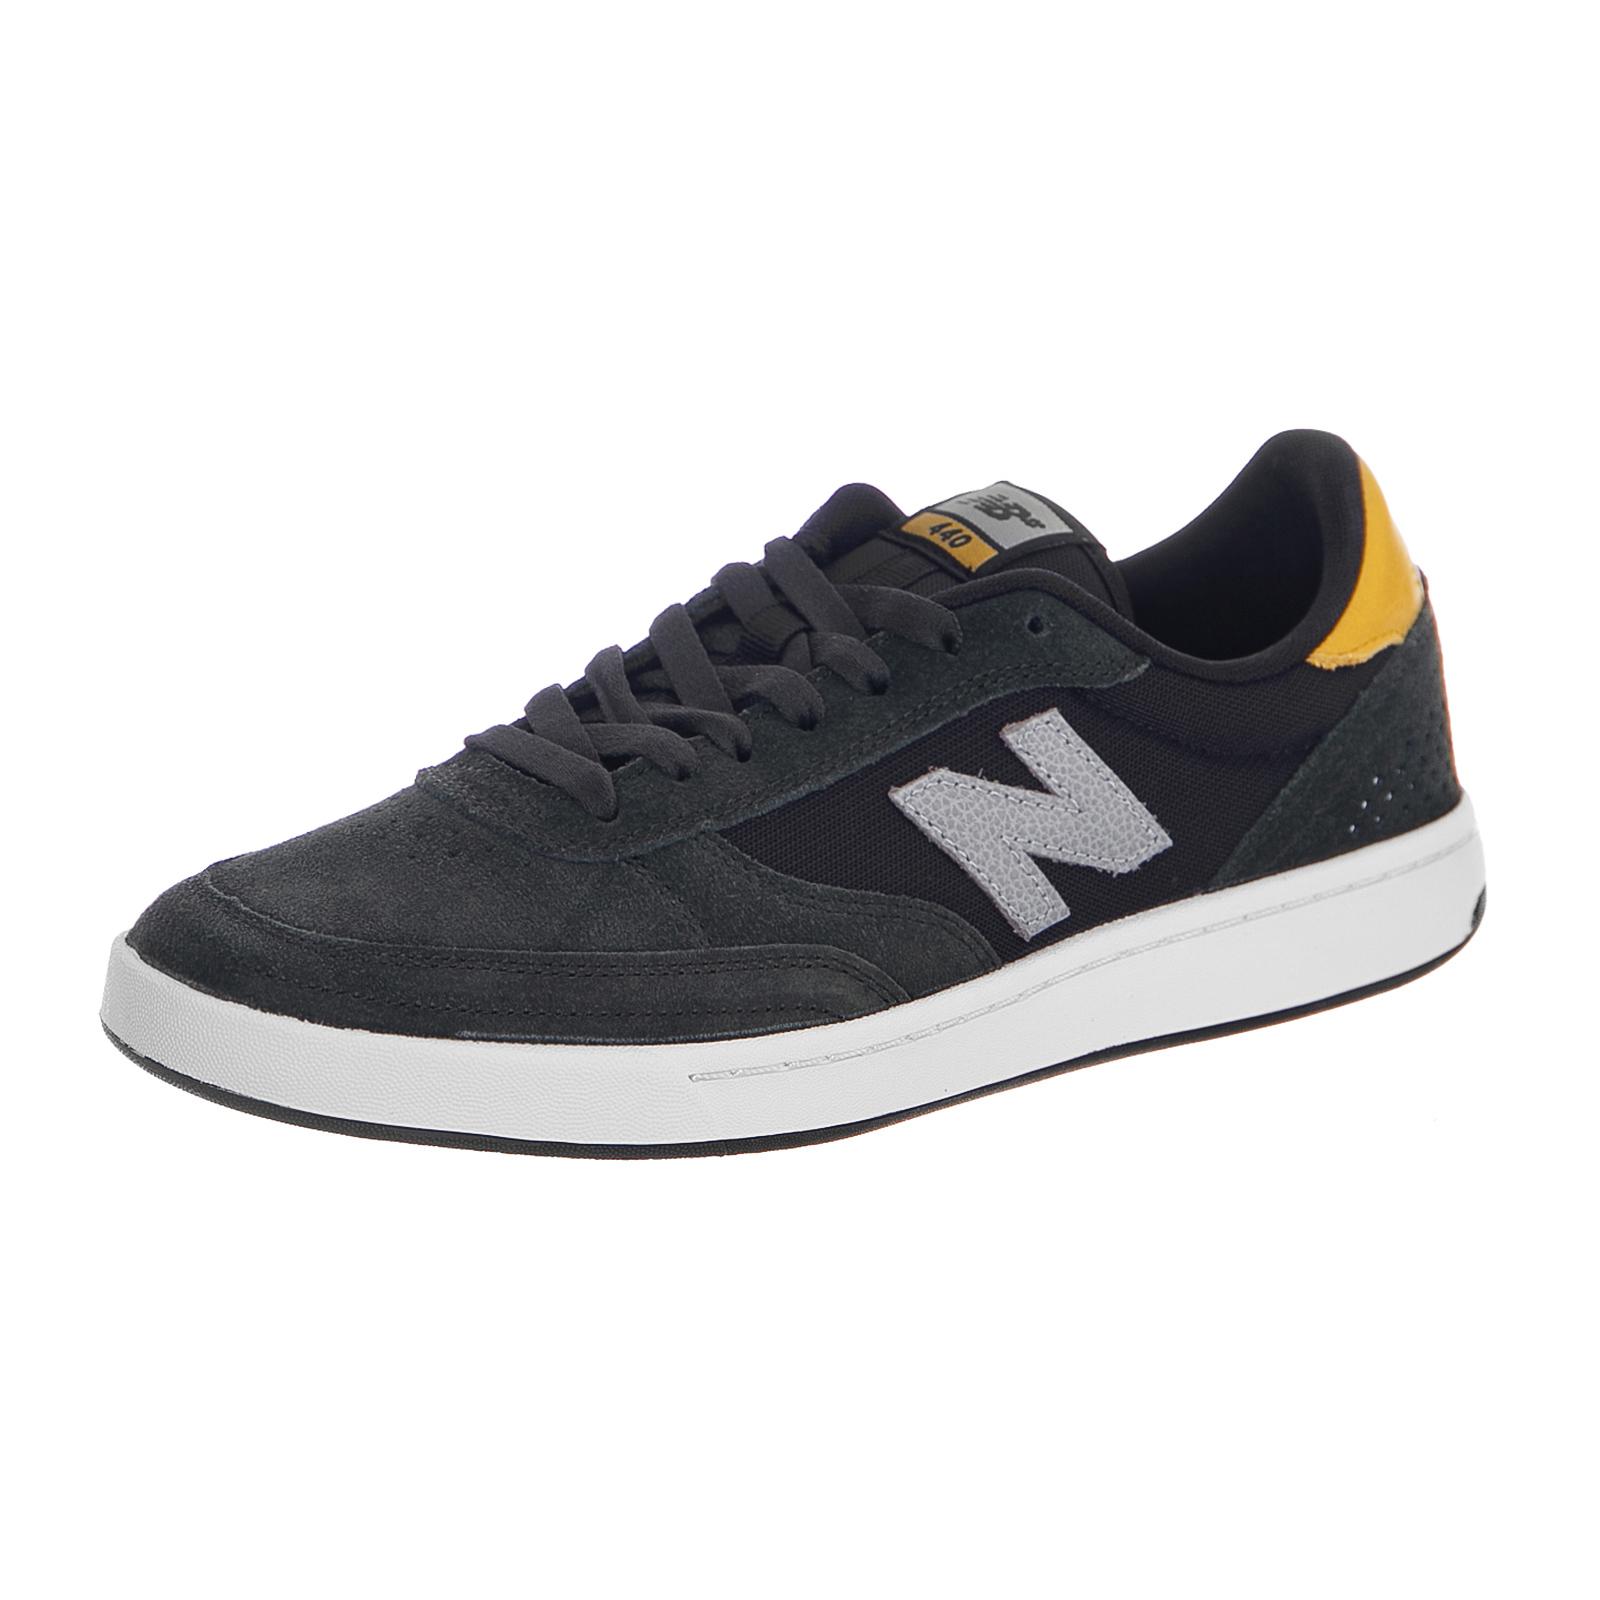 New New New Balance - Zapatillas de Cuero - azul 9c2c3b